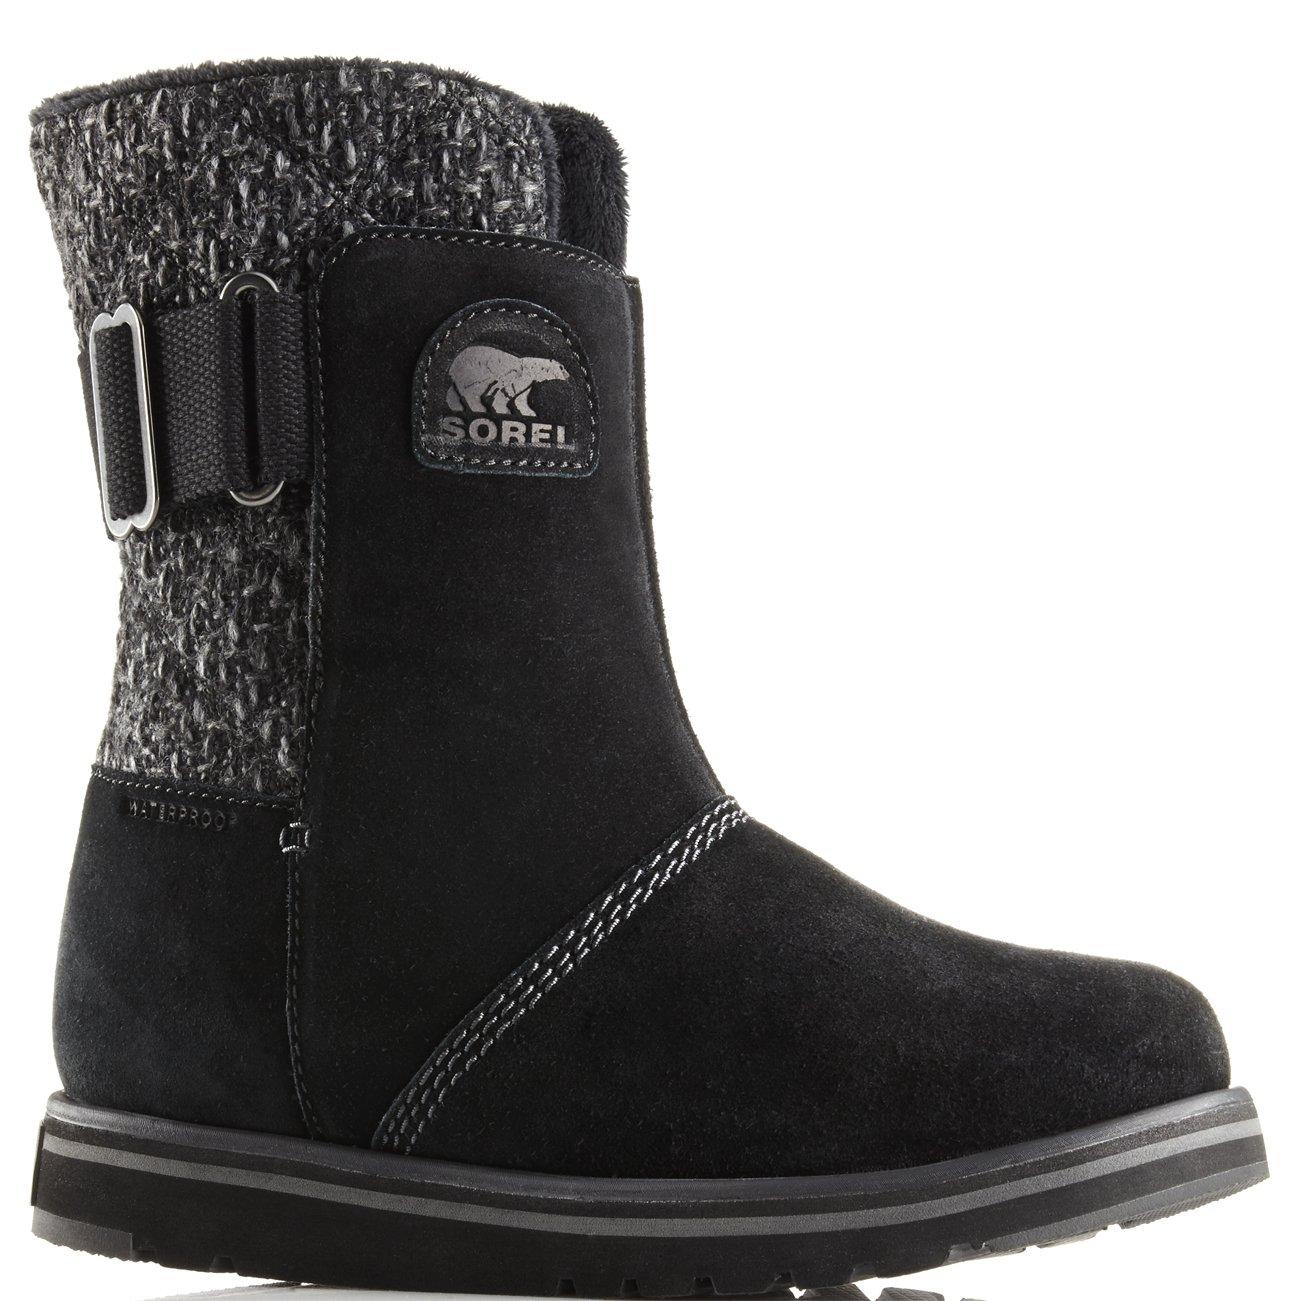 Womens Sorel Rylee Snow Warm Suede Winter Mid Calf Rain Waterproof Boots - Black - 8